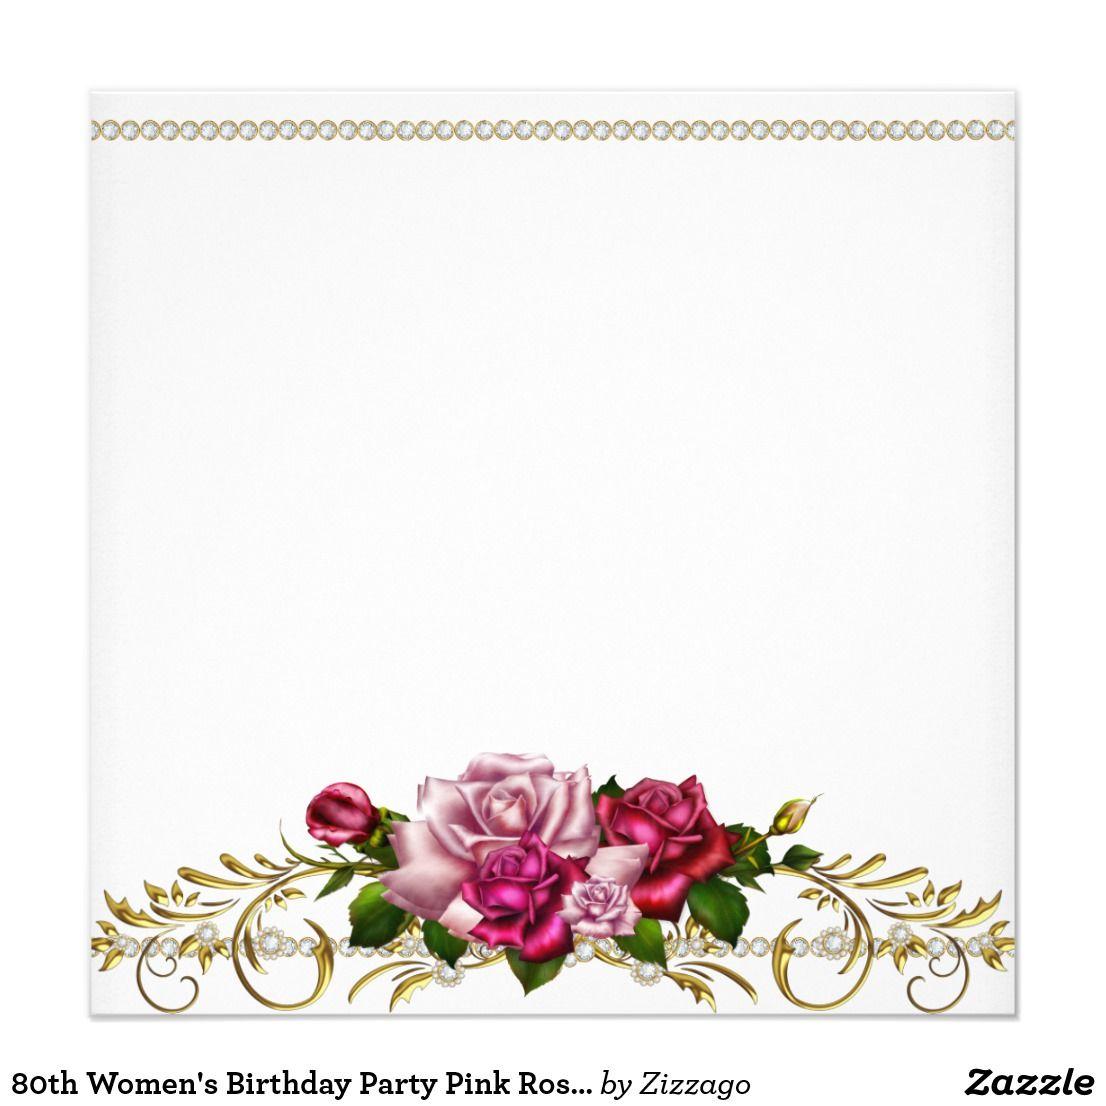 Create Your Own Invitation Zazzle Com Valentines Wallpaper Flower Frame Boarder Designs